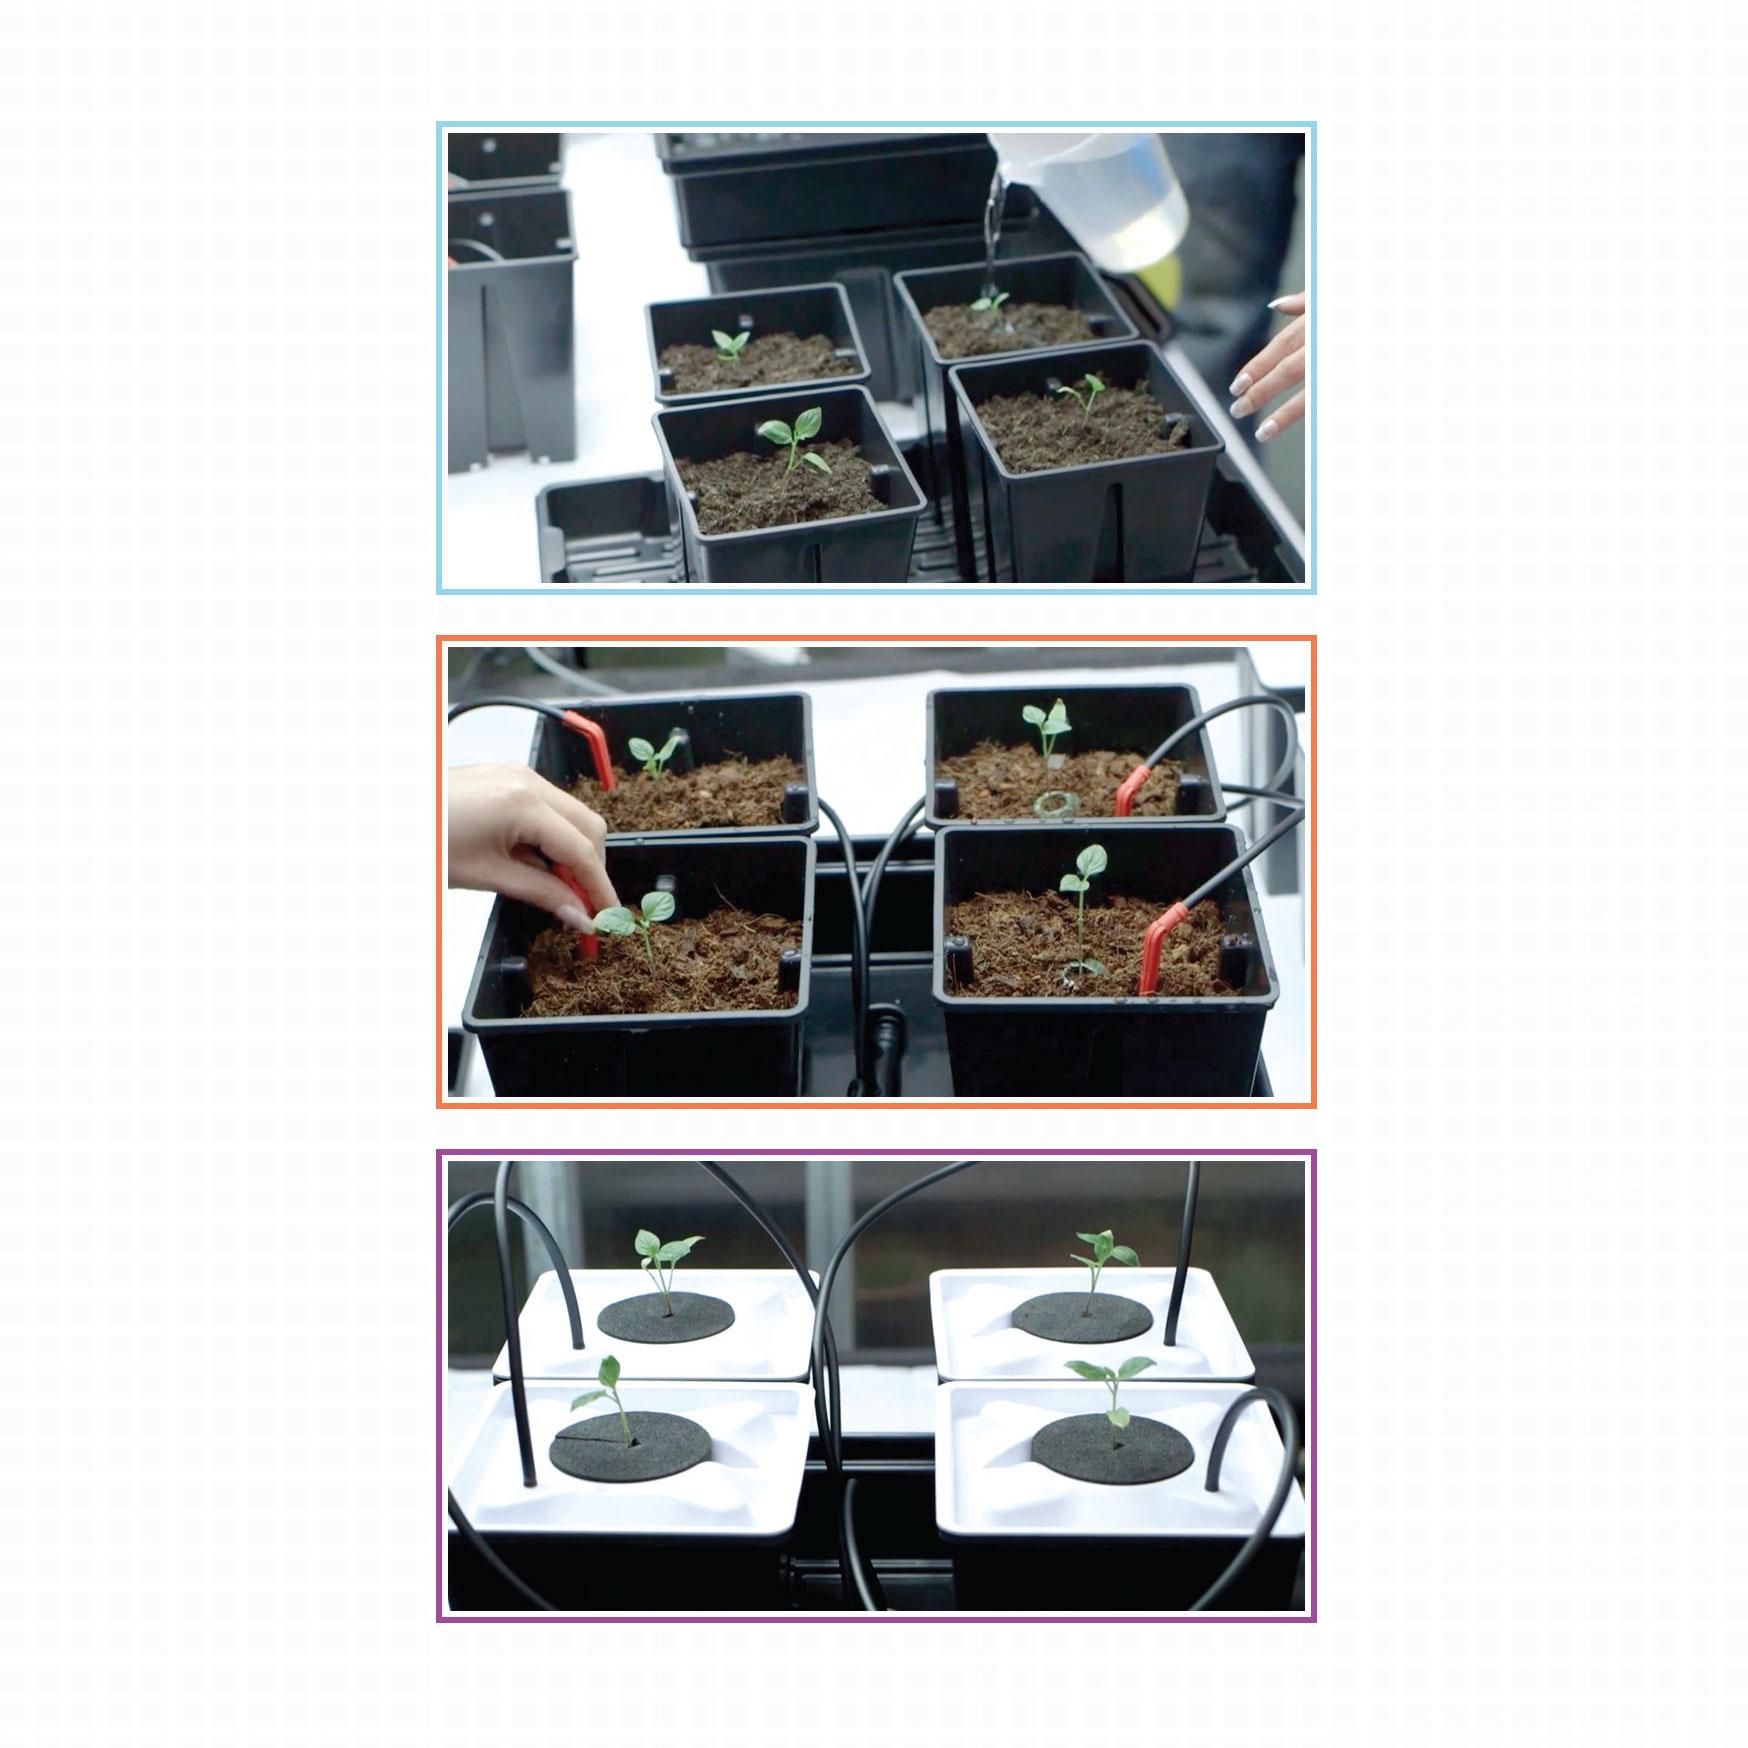 Soil, Geoponics, Hydro, Hydroponics, Aeroponics, Aero, growth media, growing medium